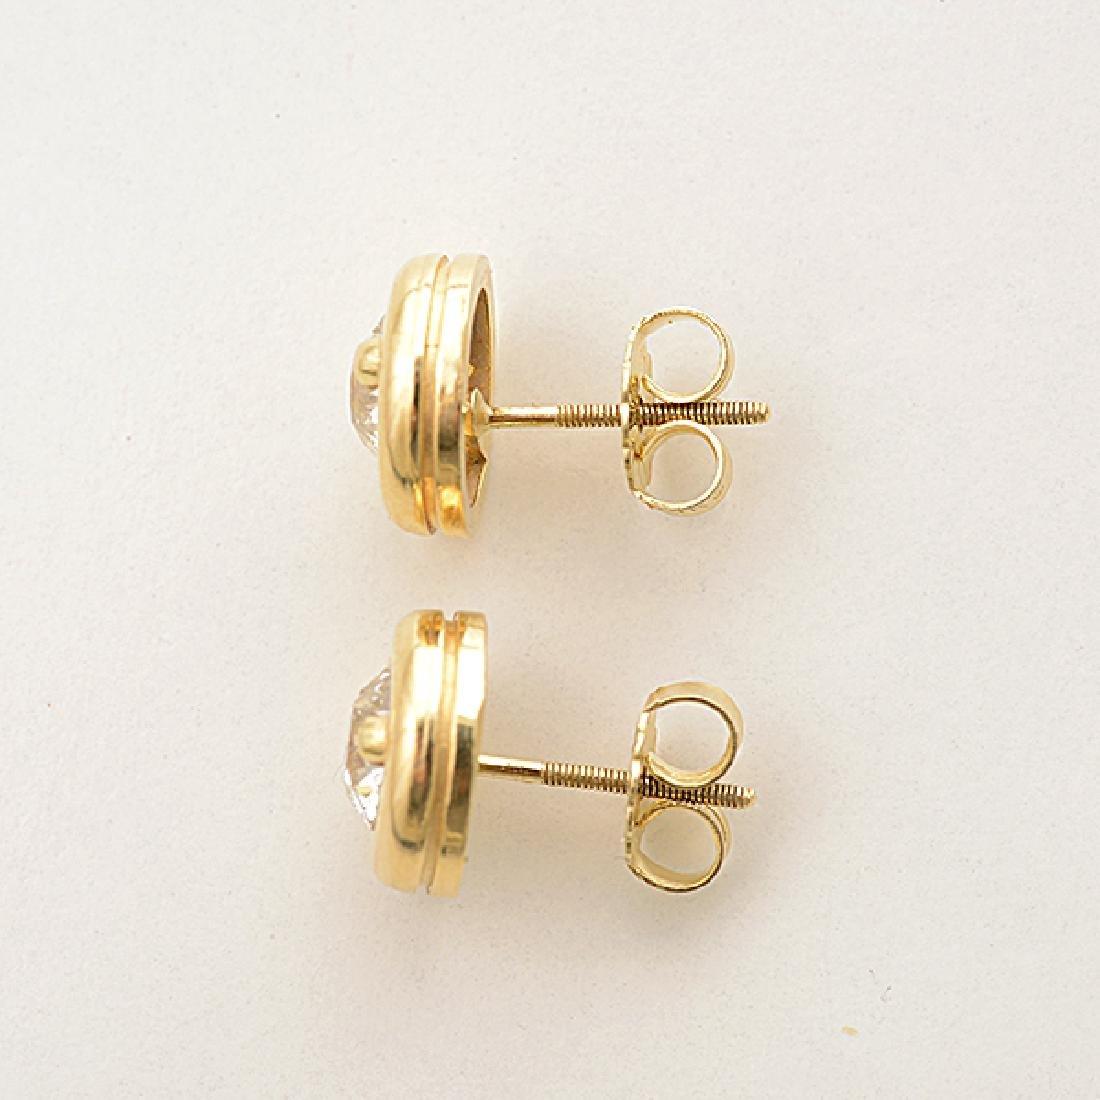 Pair of Diamond, 14k Yellow Gold Stud Earrings. - 3